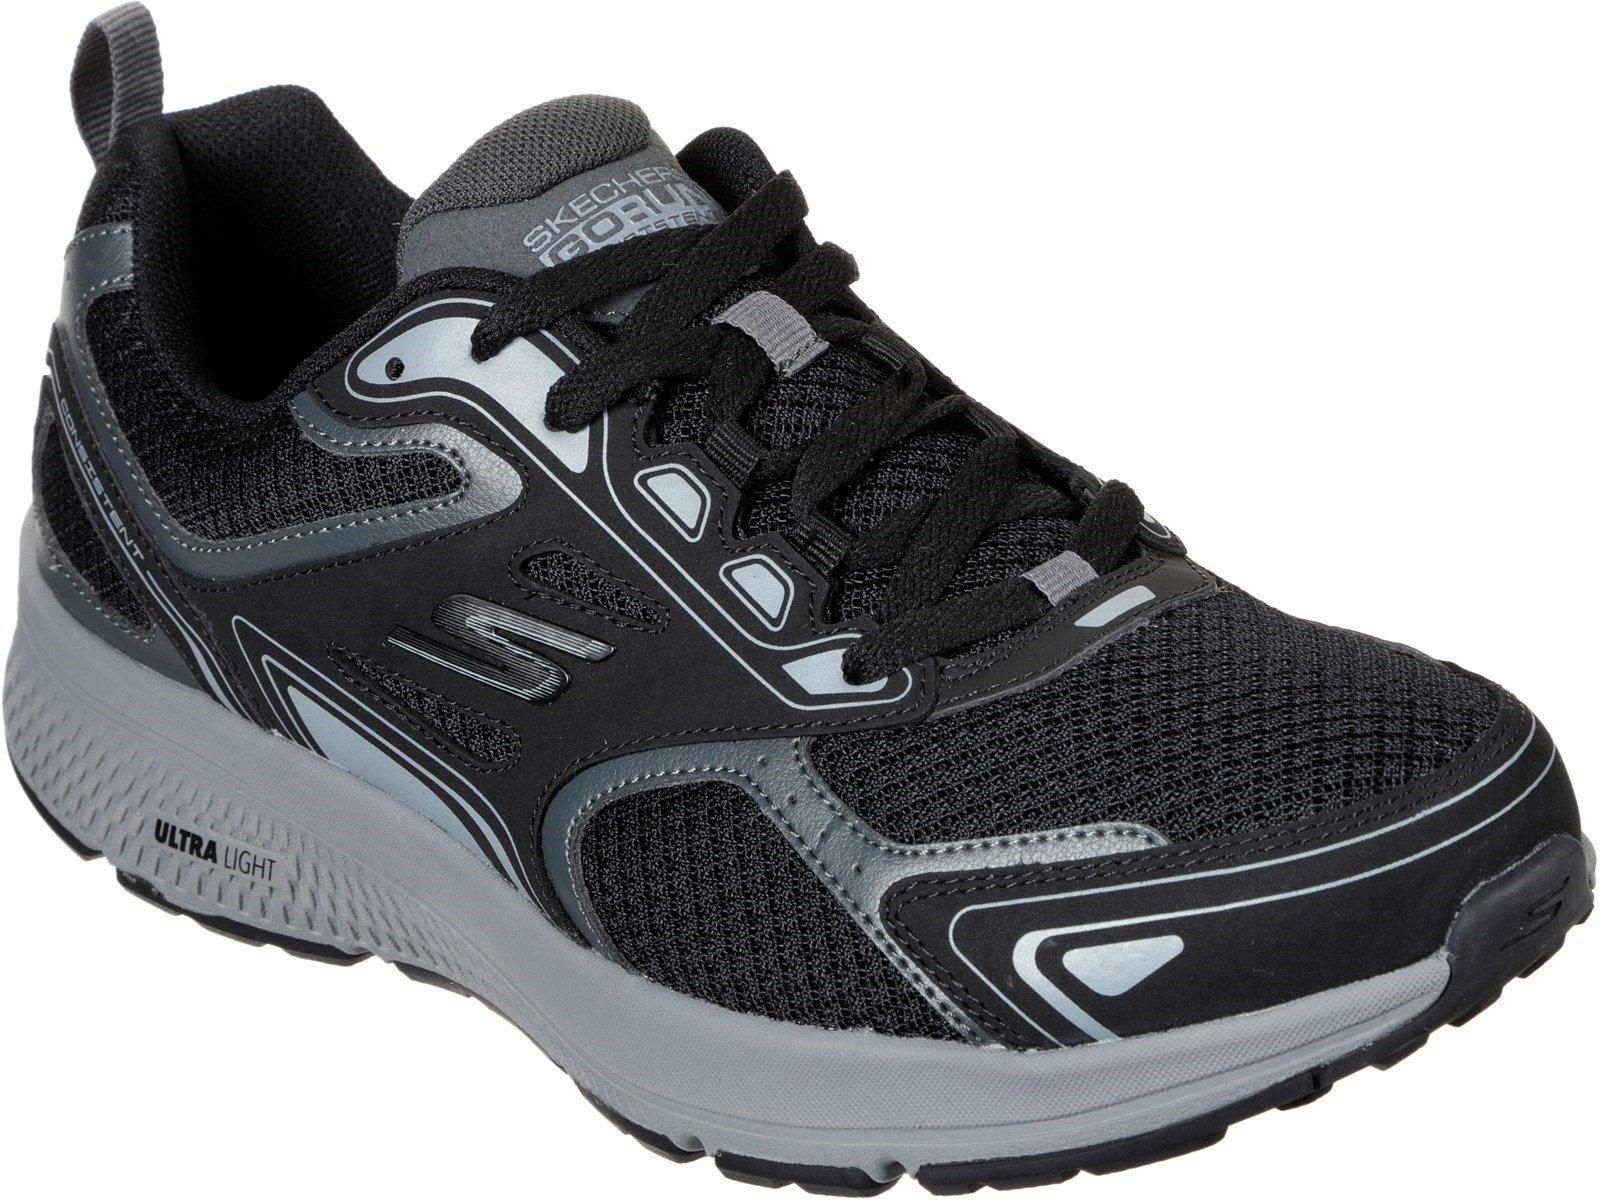 Skechers Men's GOrun Consistent Sports Trainer Various Colours 32204 - Black/Grey 6